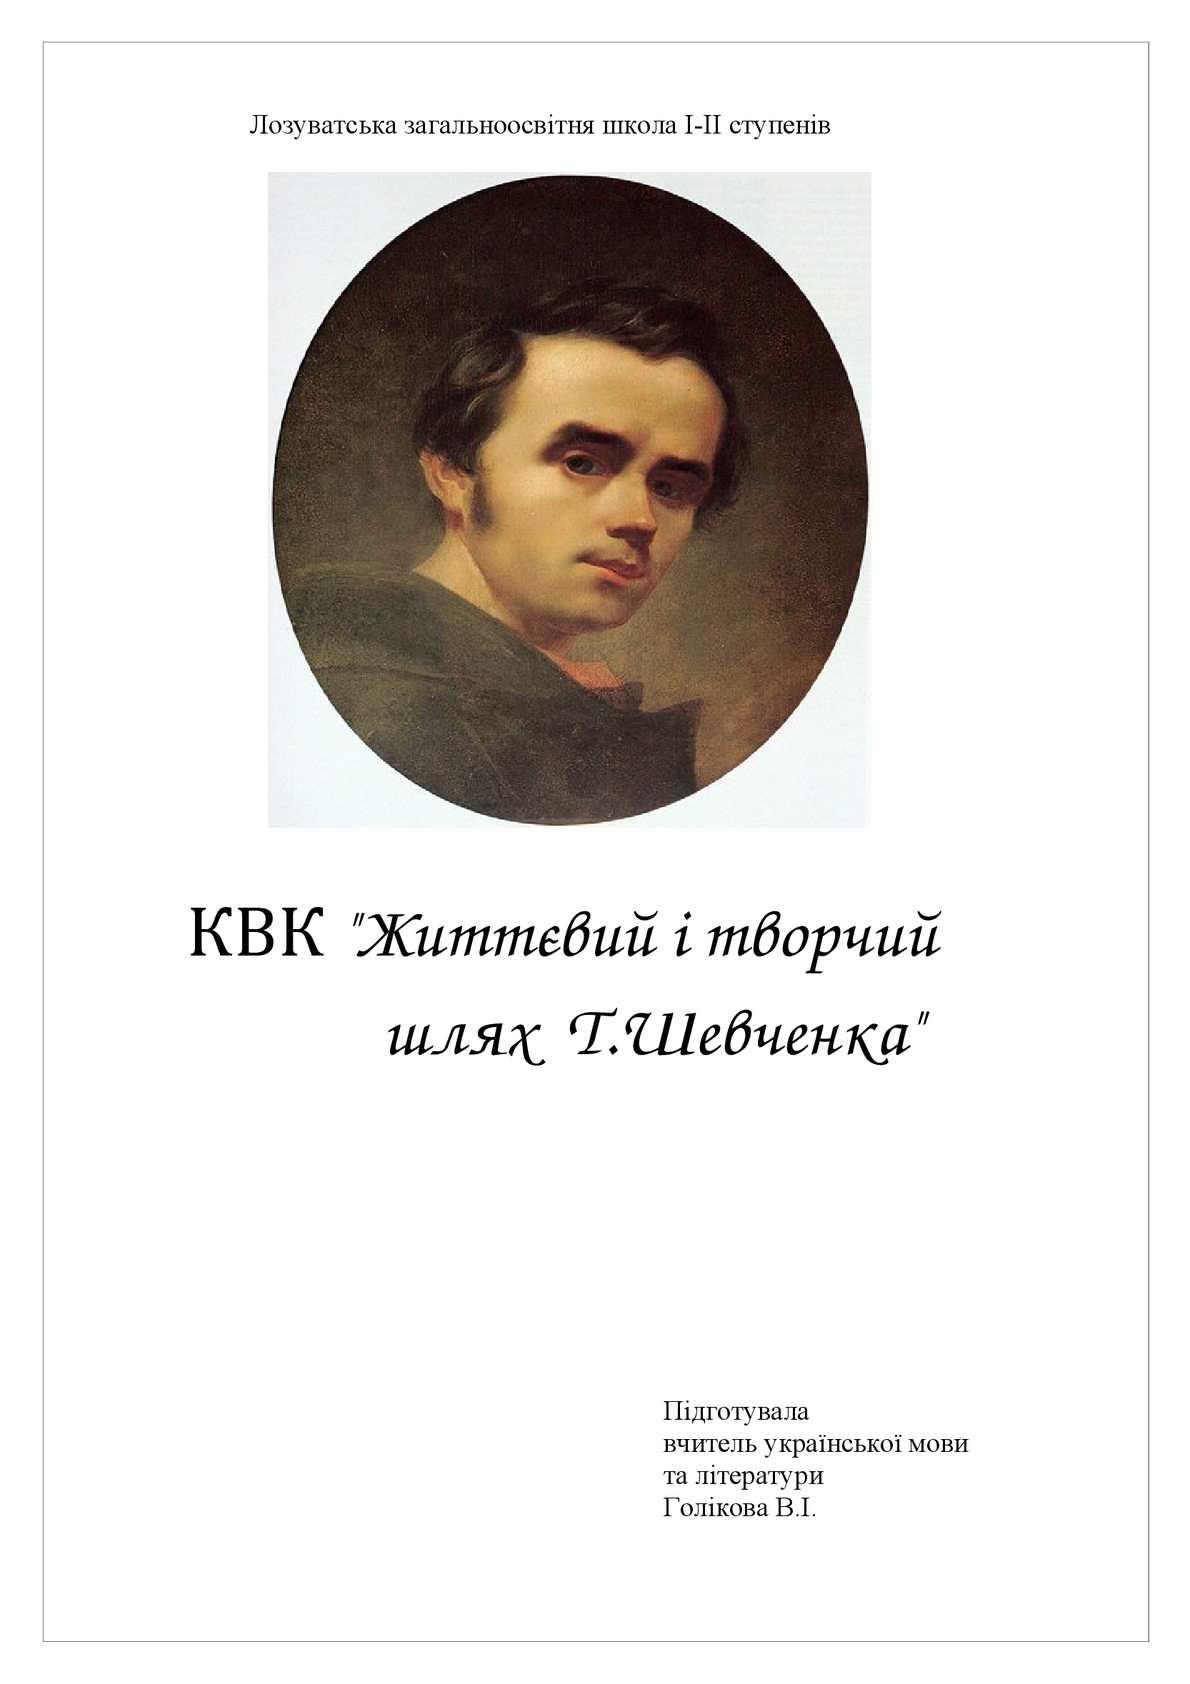 Лозуватська ЗШ (КВК до Т.Шевченка)